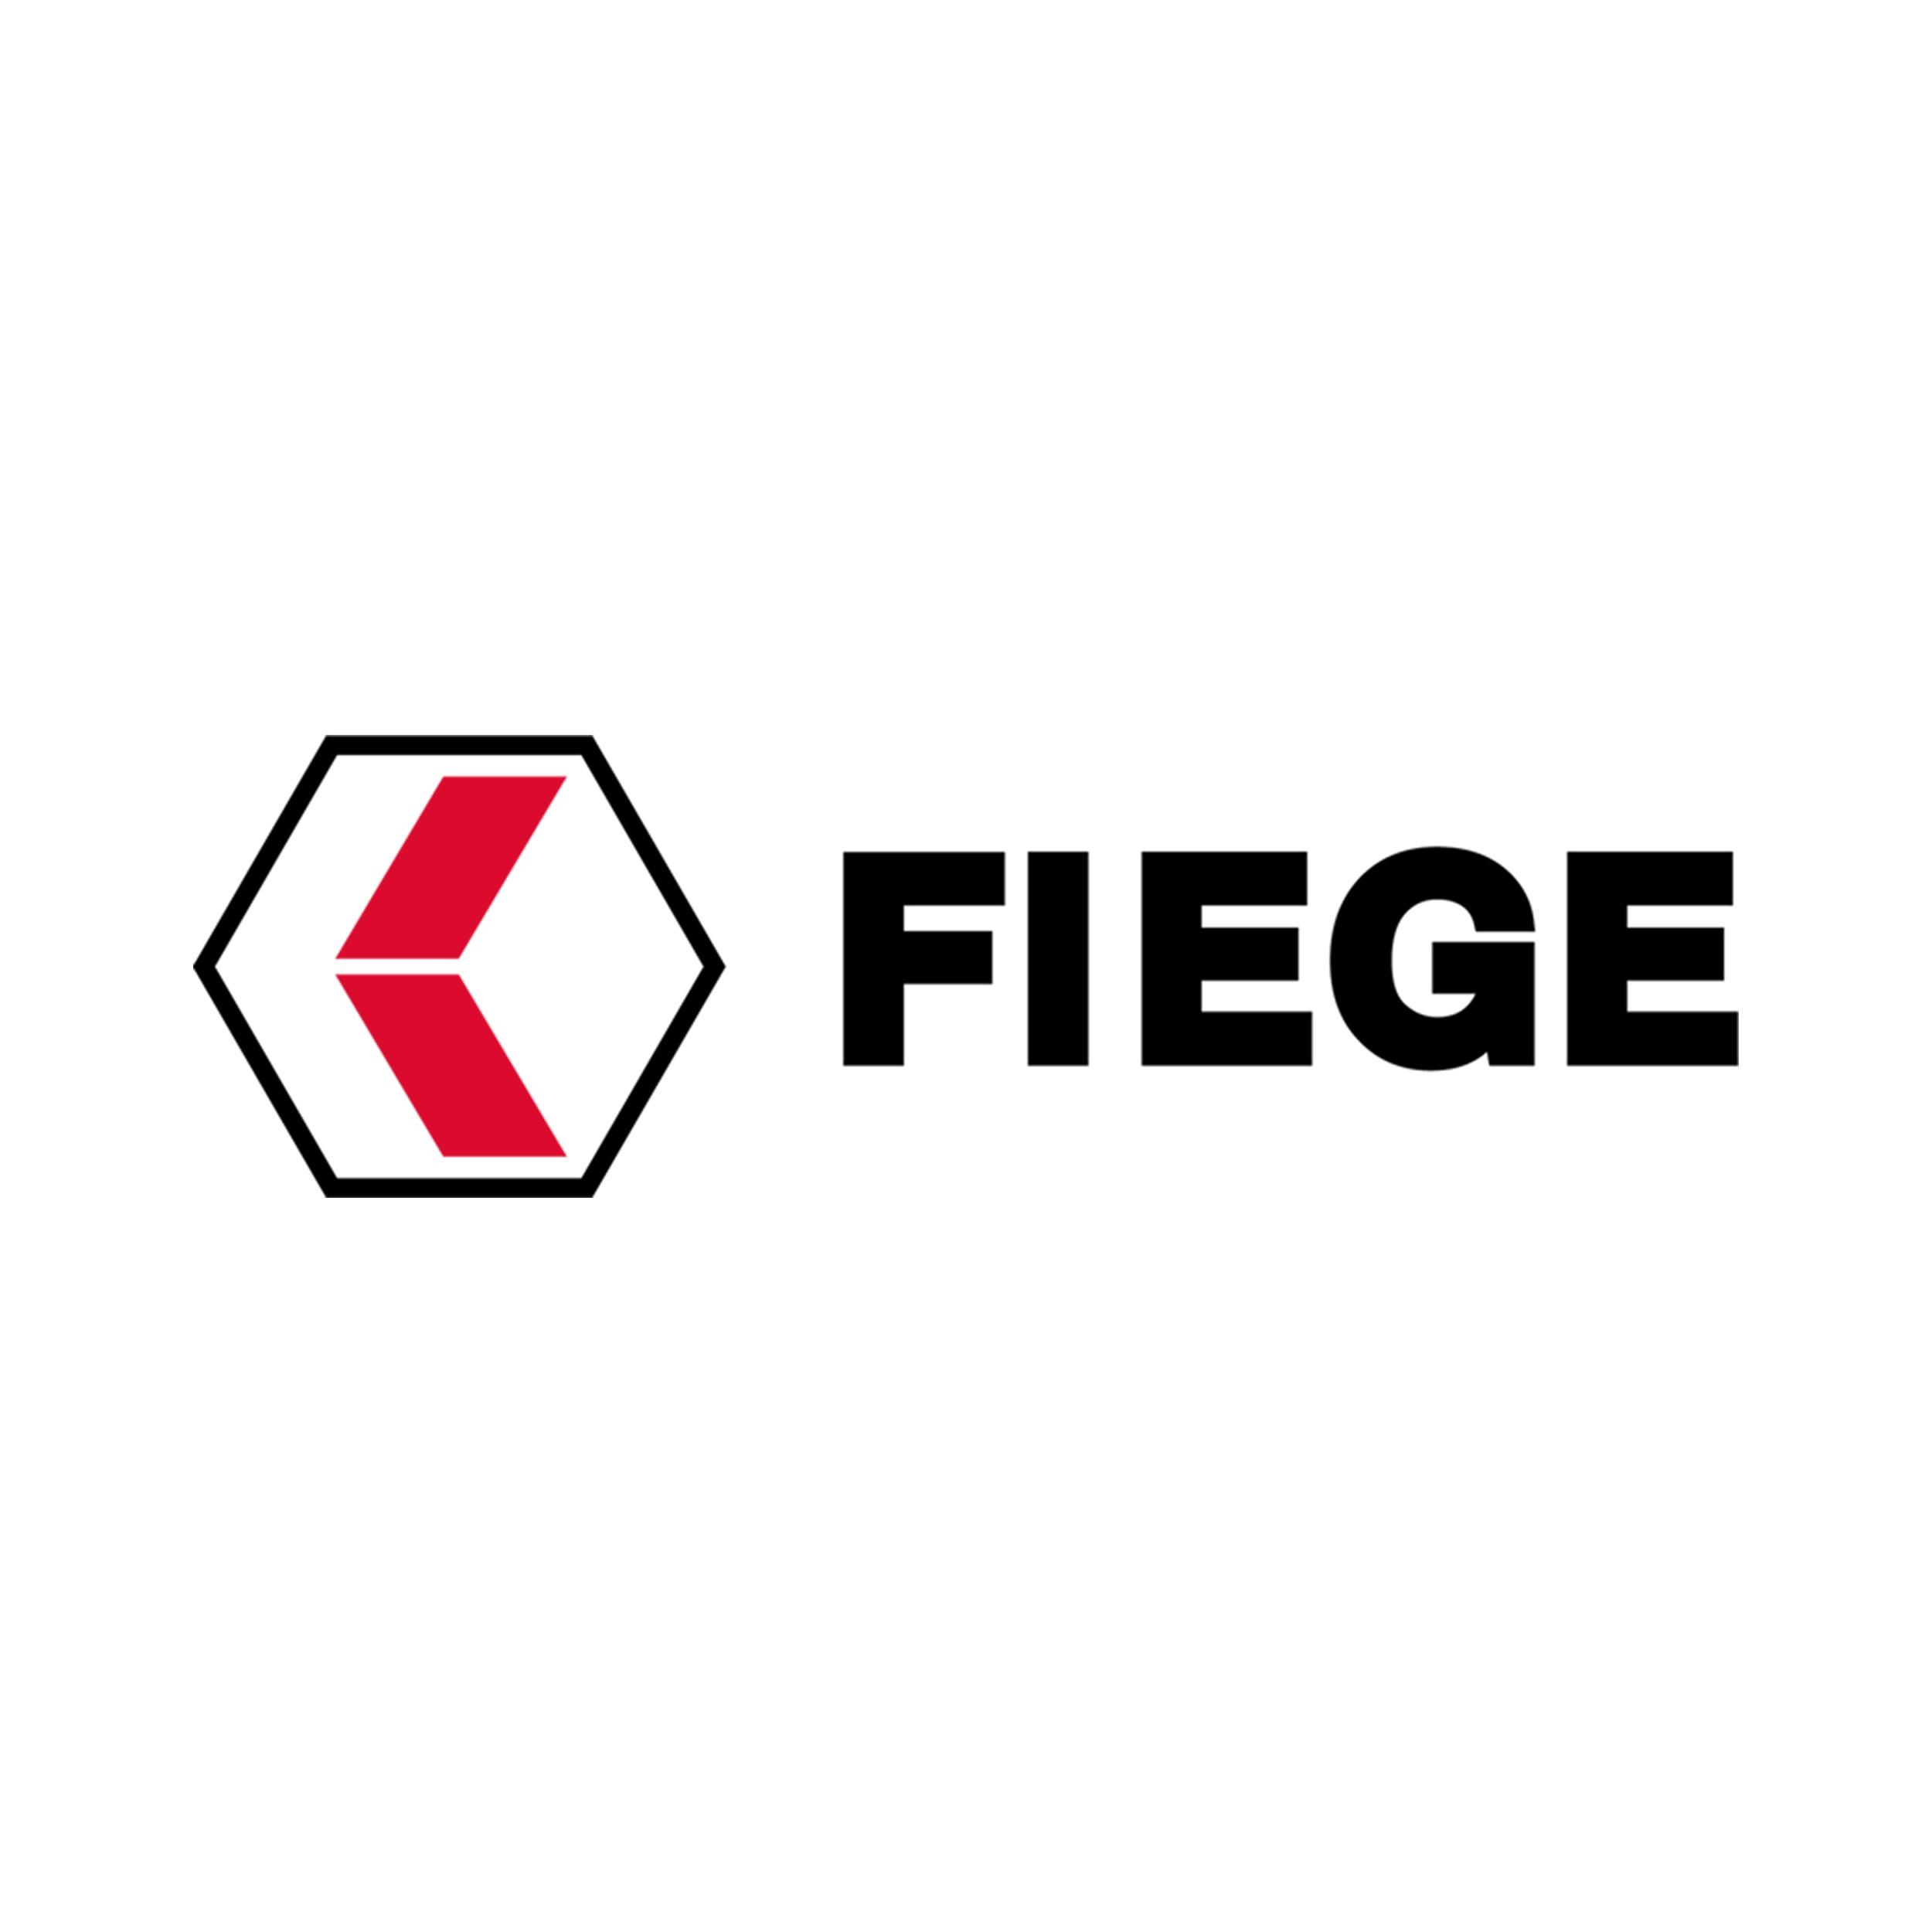 Bocholt800_Silber-Fiege_20210811